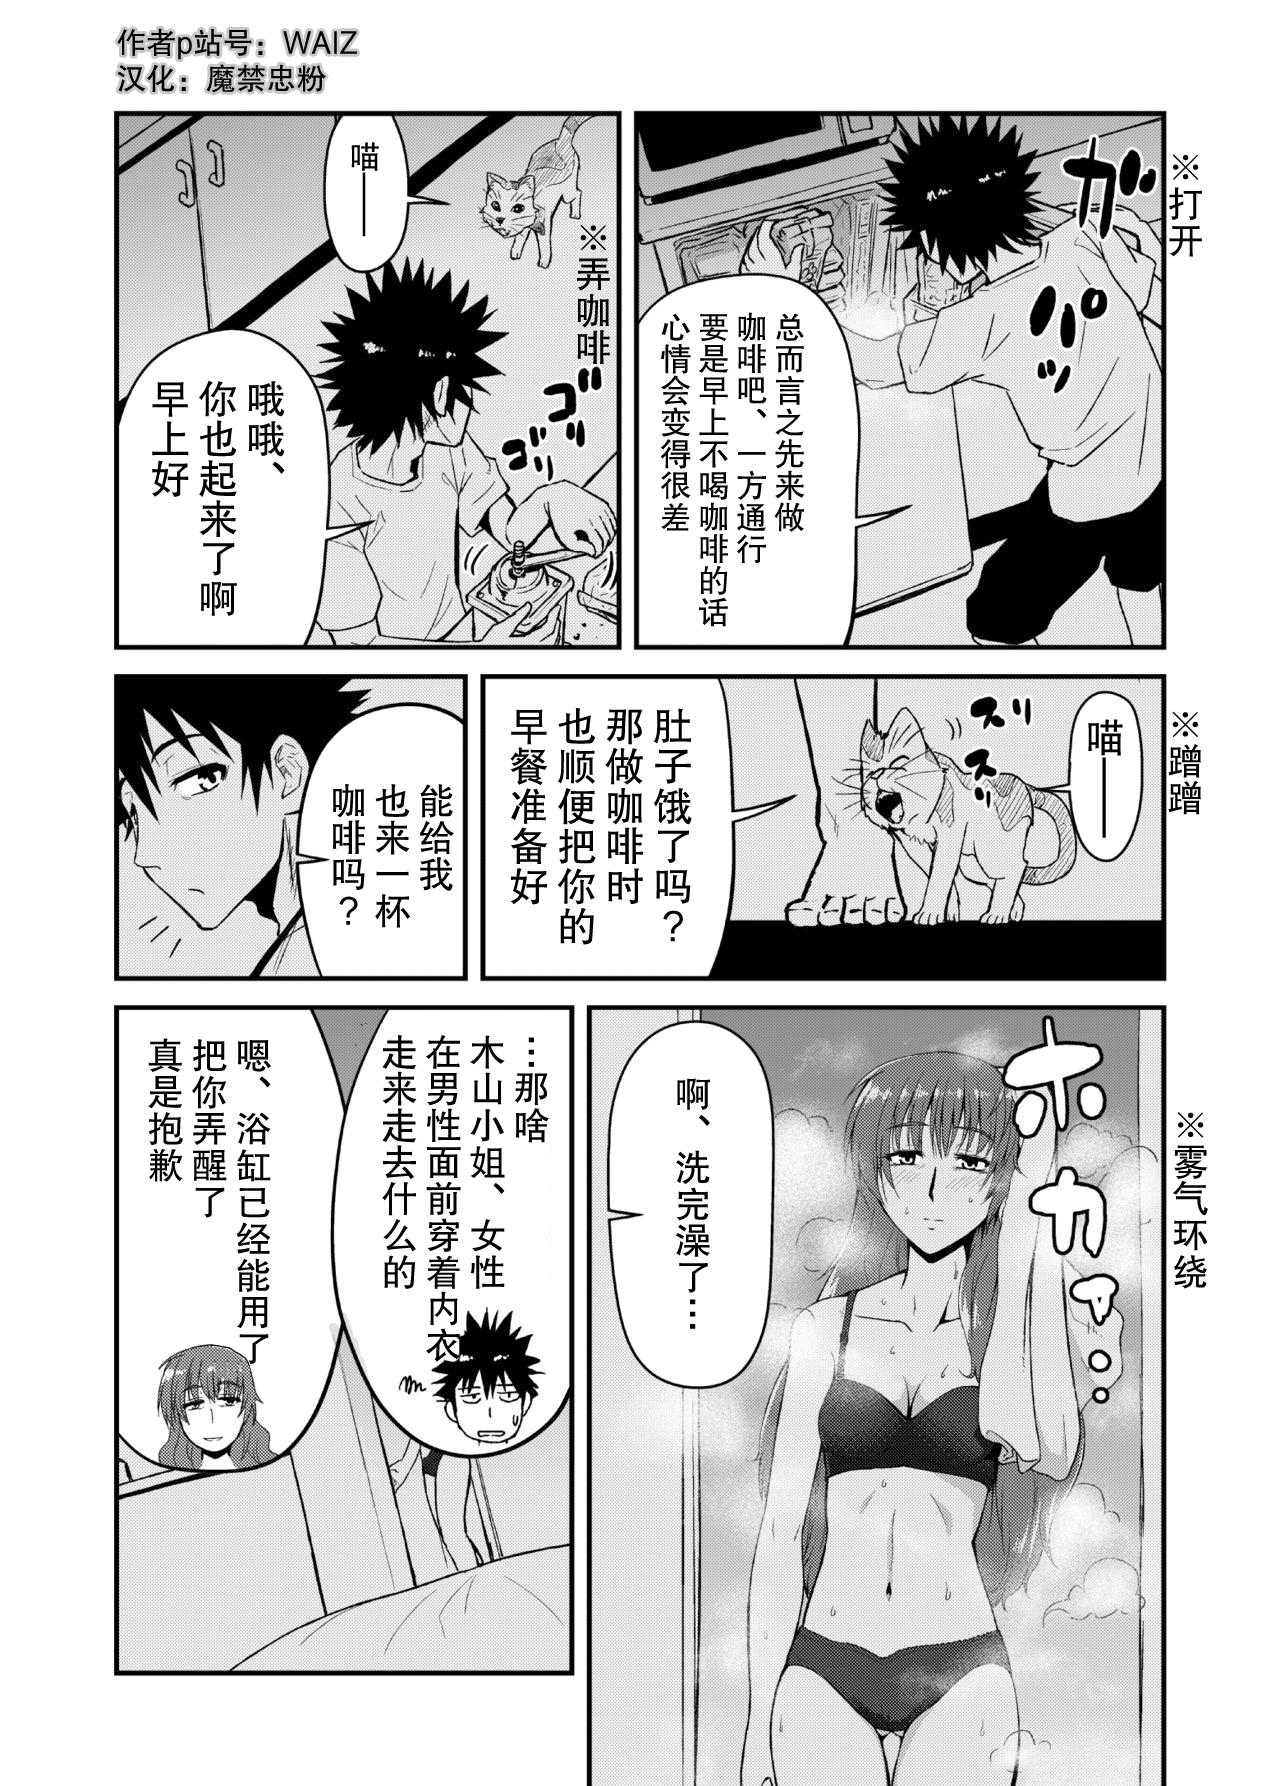 [WAIZ][同人个人渣汉化][就算是上条先生我家要住7个人还是太勉强了](Toaru Majutsu no Index) [中国翻译] 41